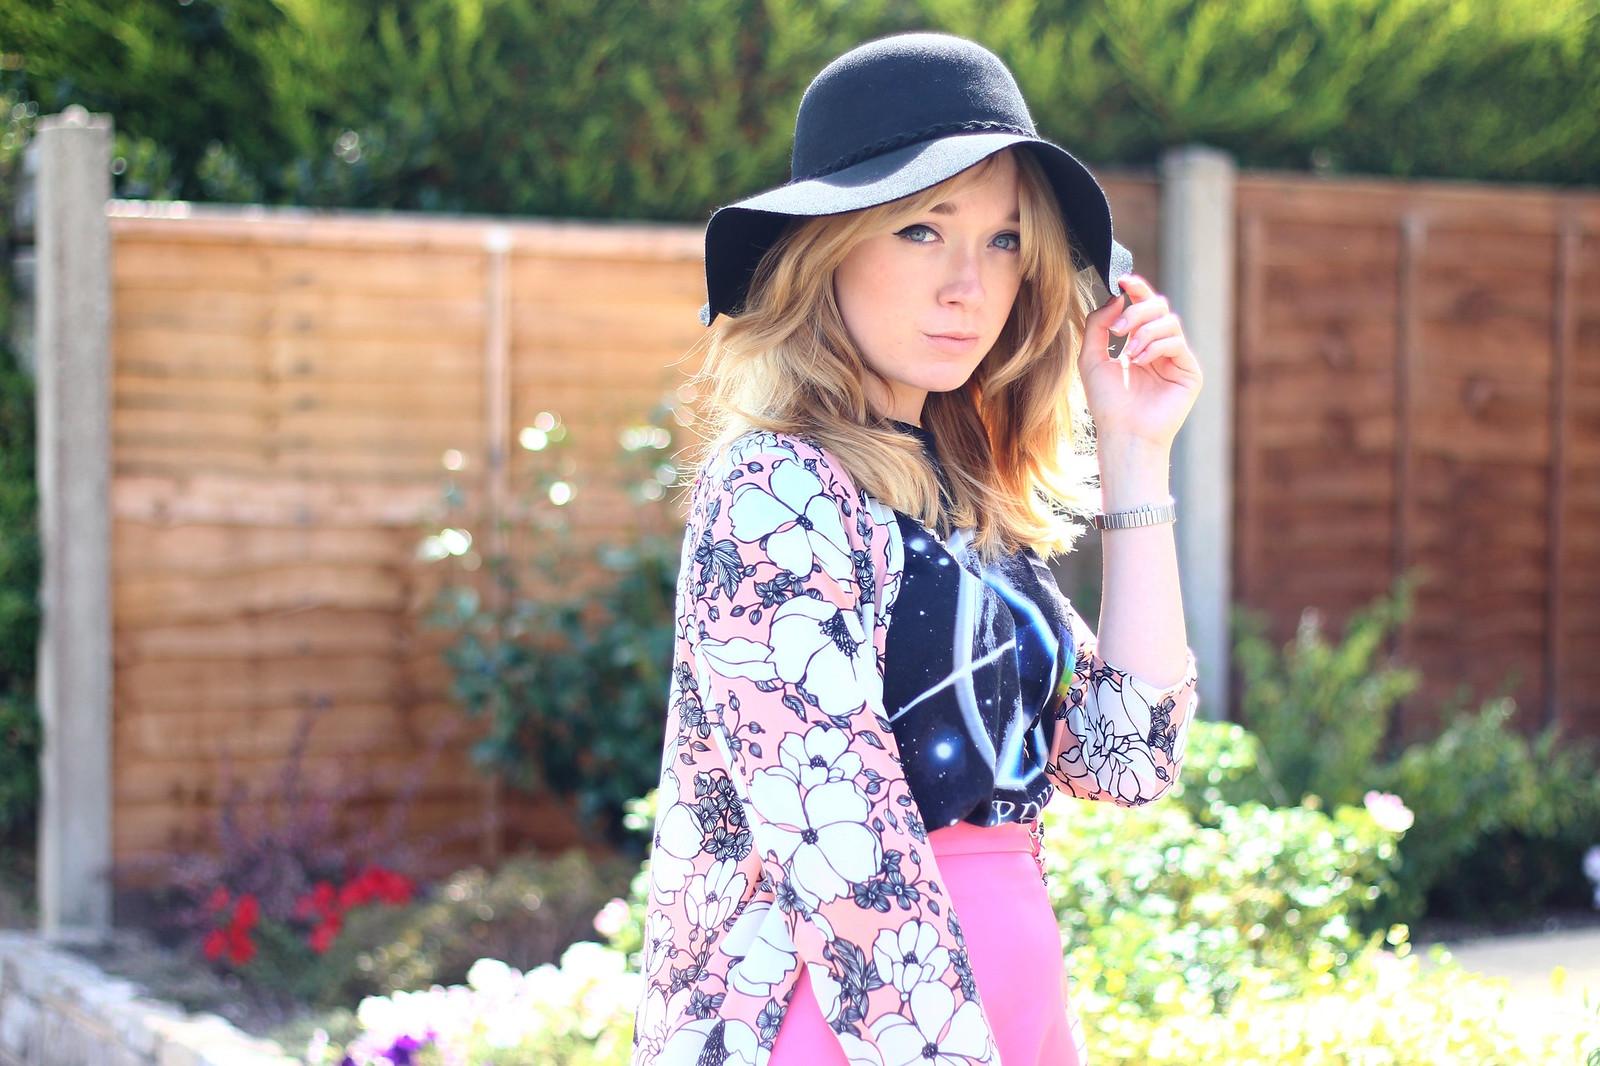 3pinkfloydtee, band tee pink skirt outfit, style, boho